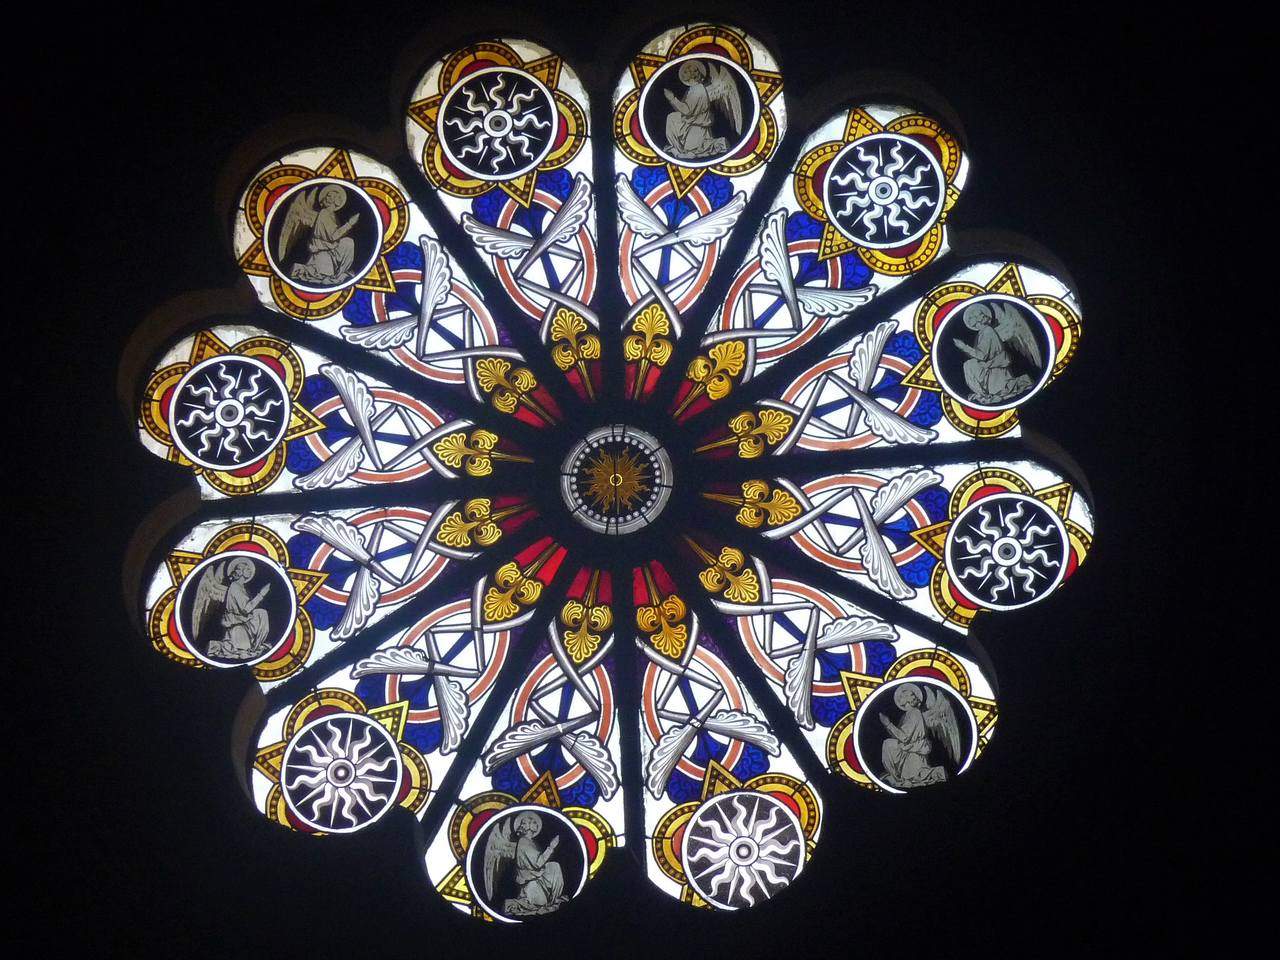 Santa Maria sopra Minerva (11)